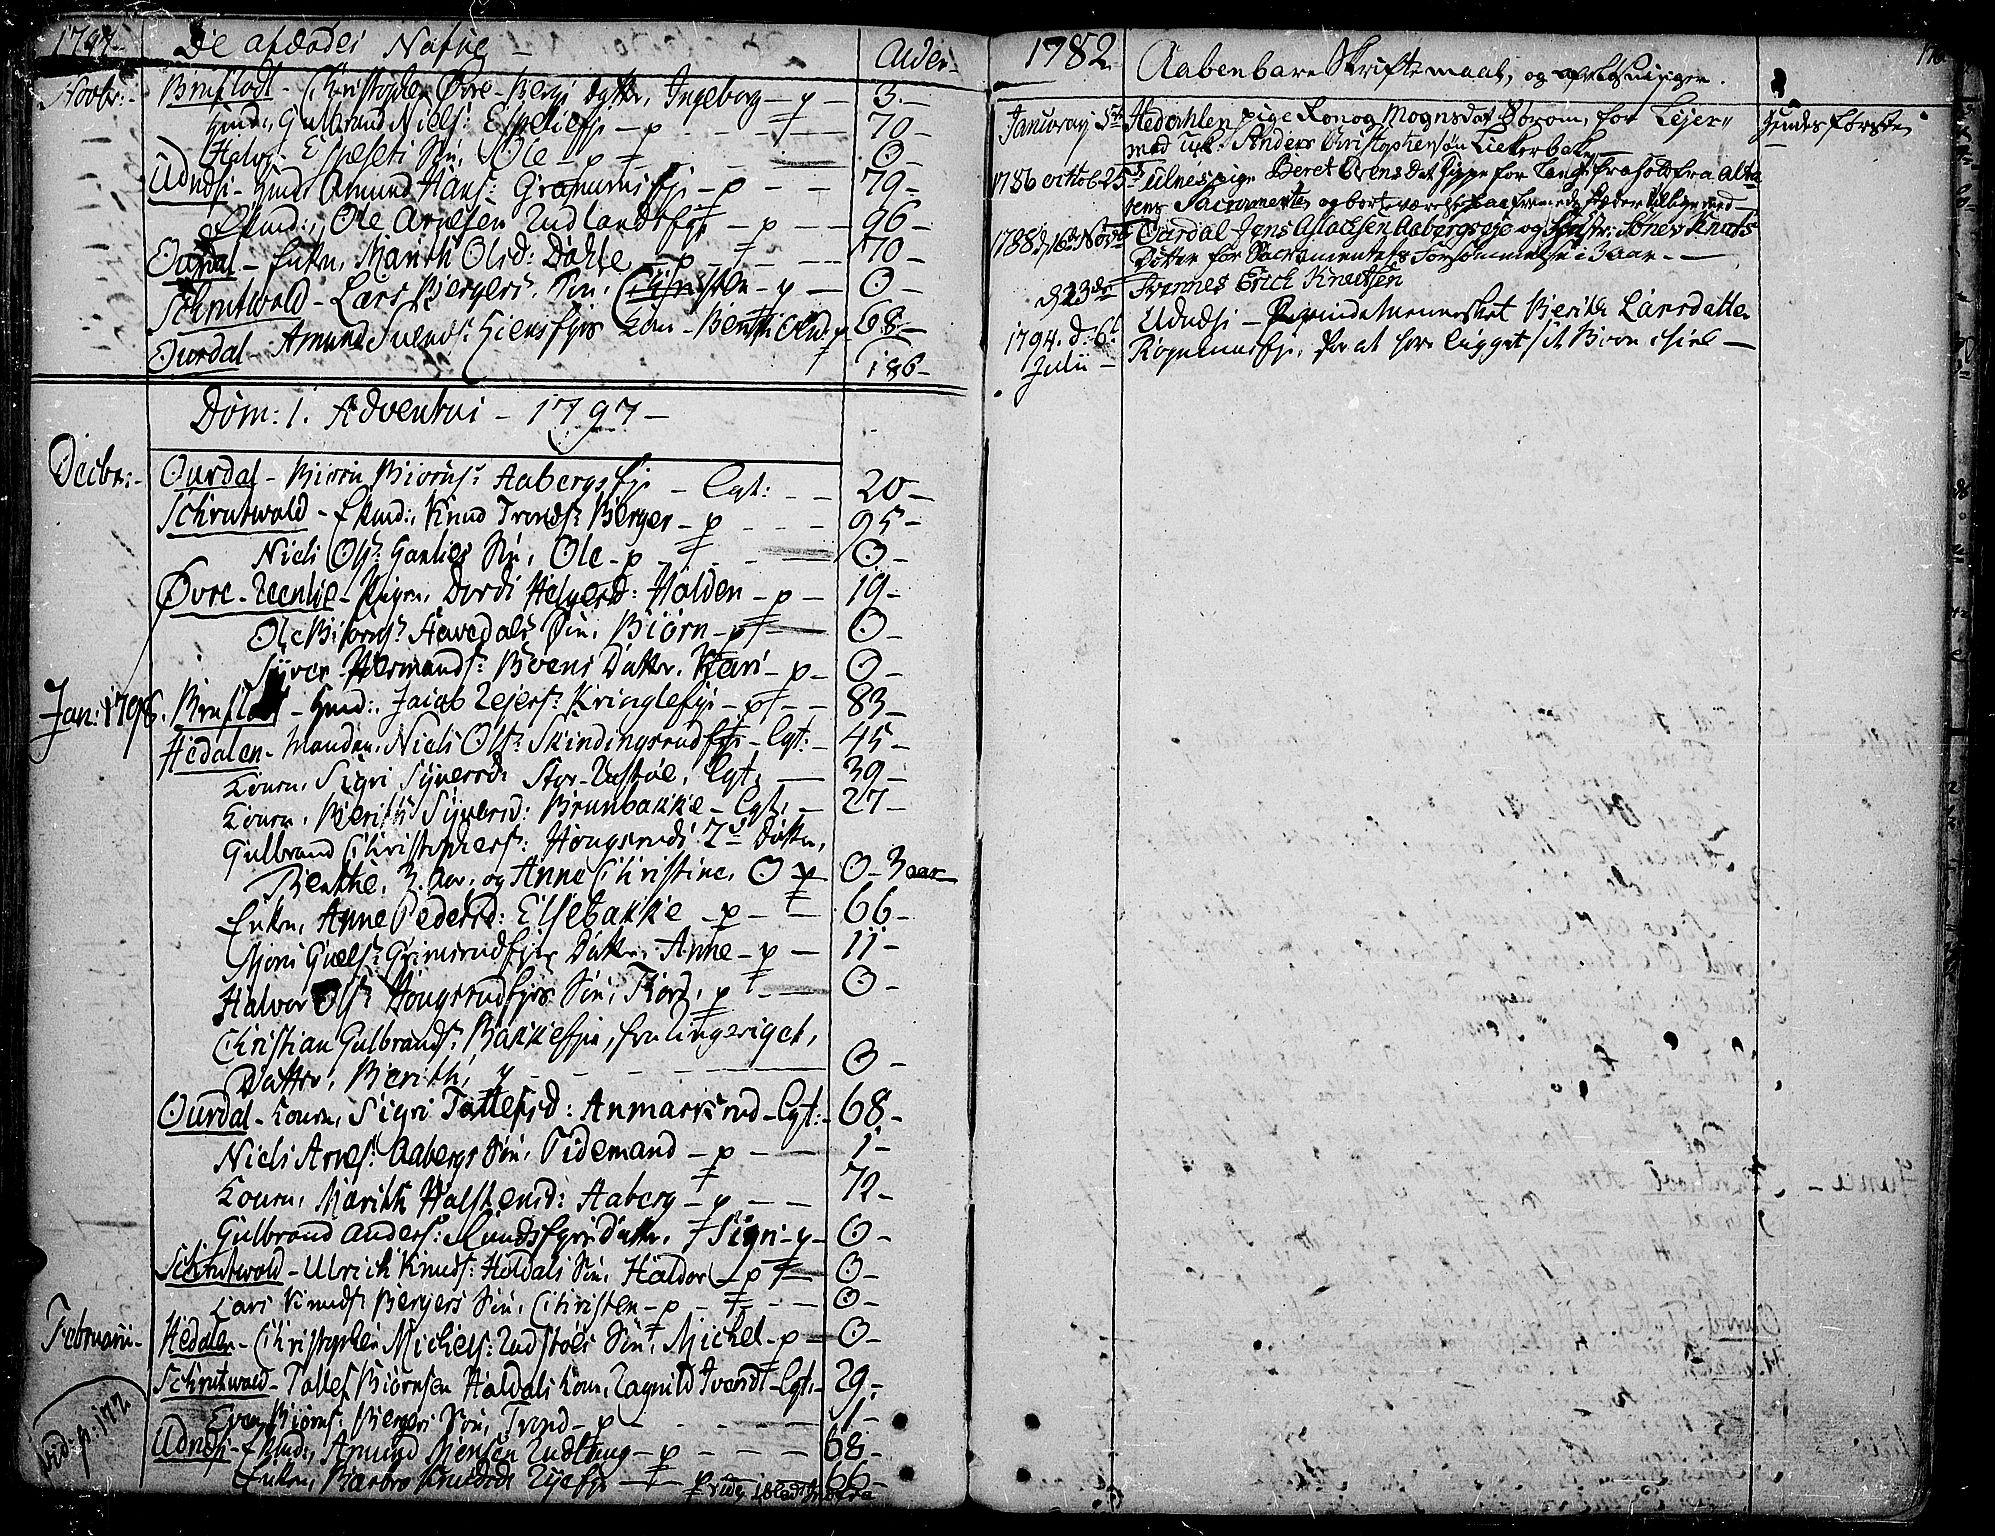 SAH, Aurdal prestekontor, Ministerialbok nr. 6, 1781-1804, s. 176